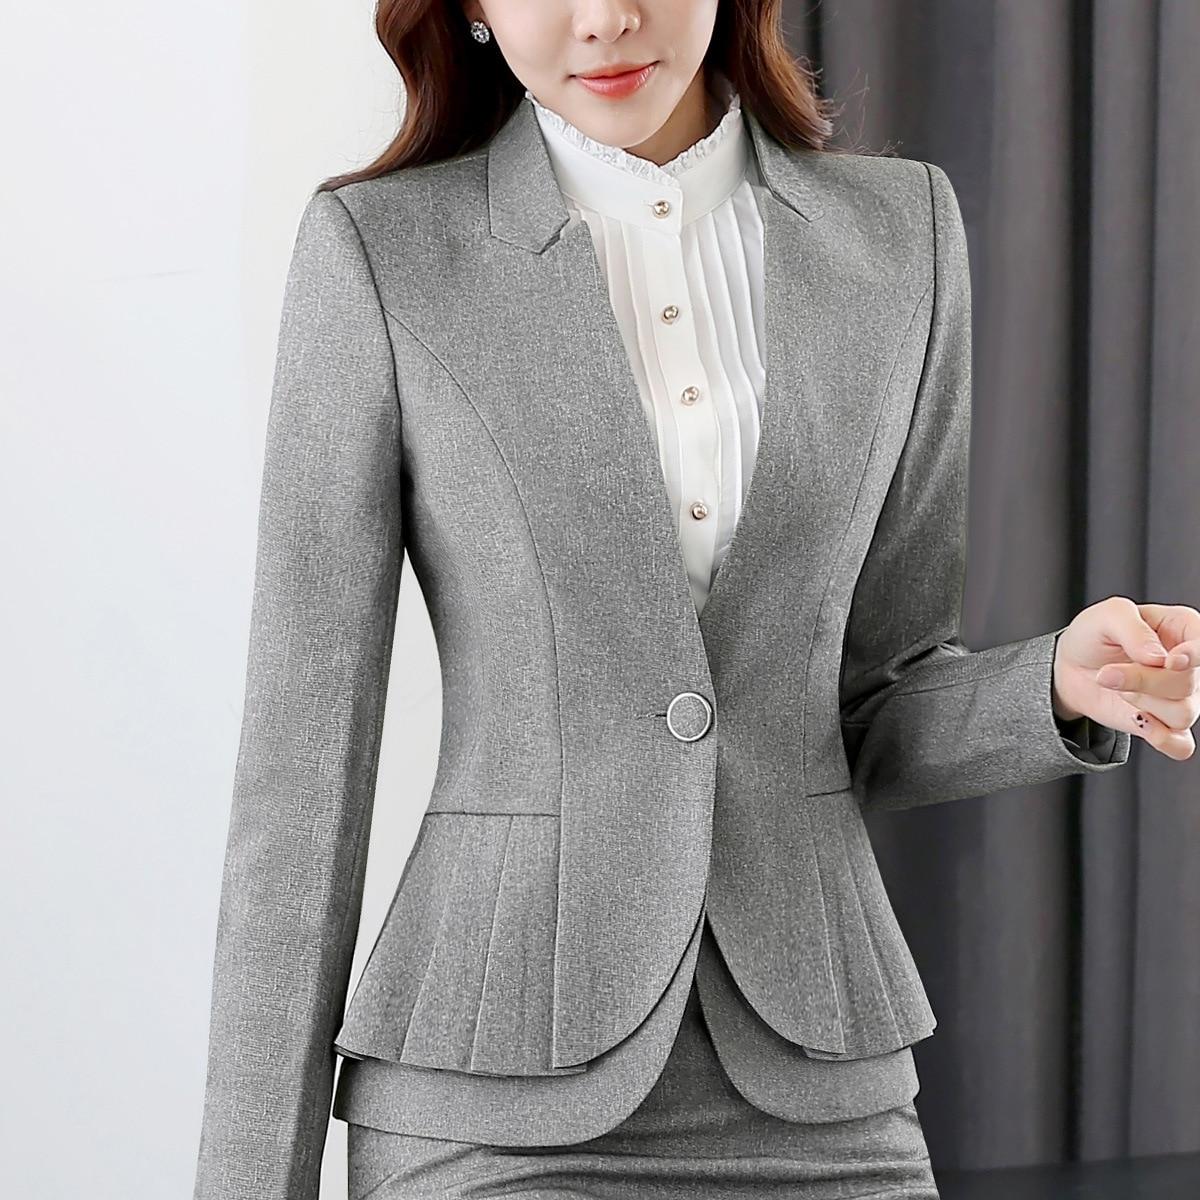 Professional Women Skirt Suits Blazers Autumn Business Ladies Office Work Wear White collar (jacket/Skirt /shirt / pants) - 4